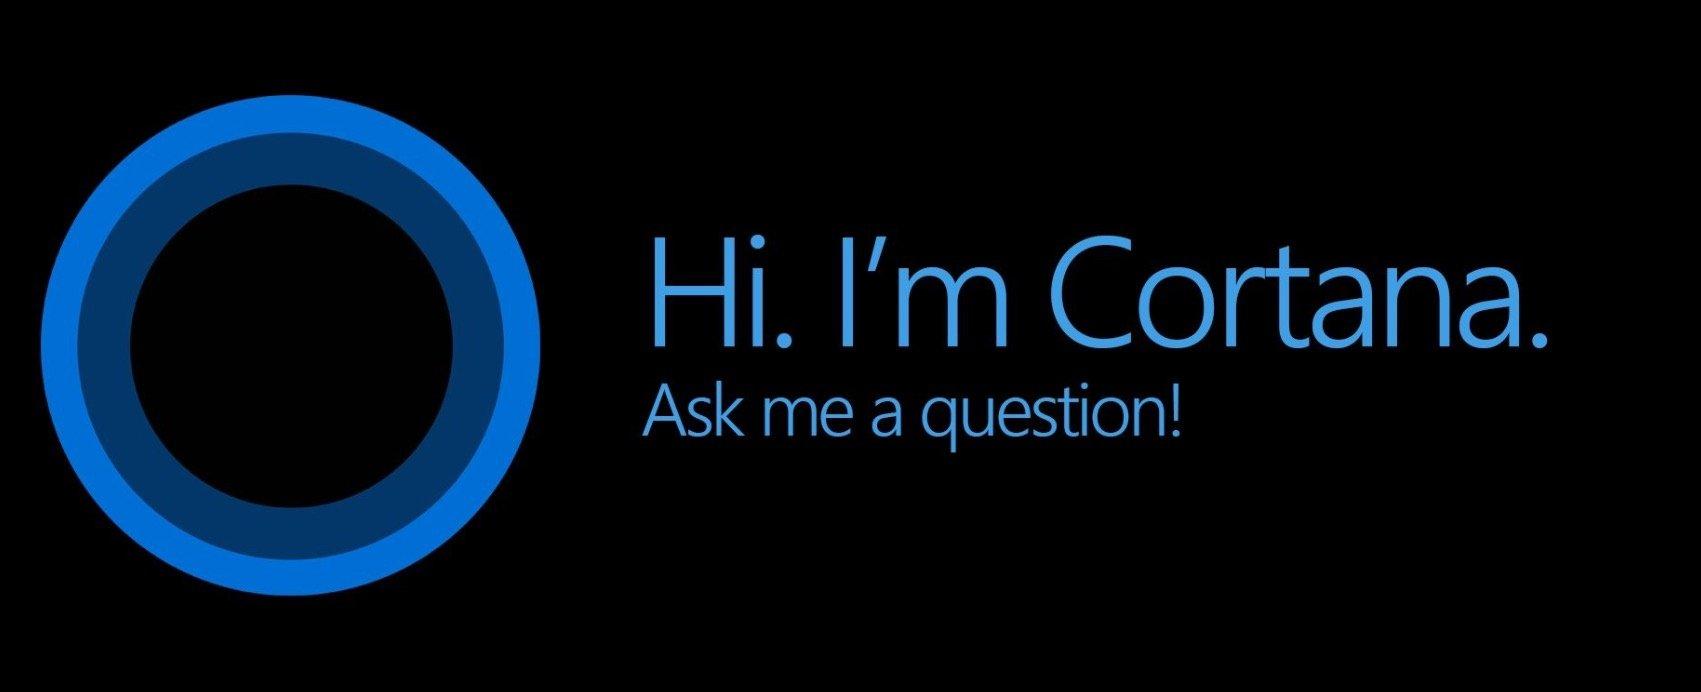 Cortana Search Image